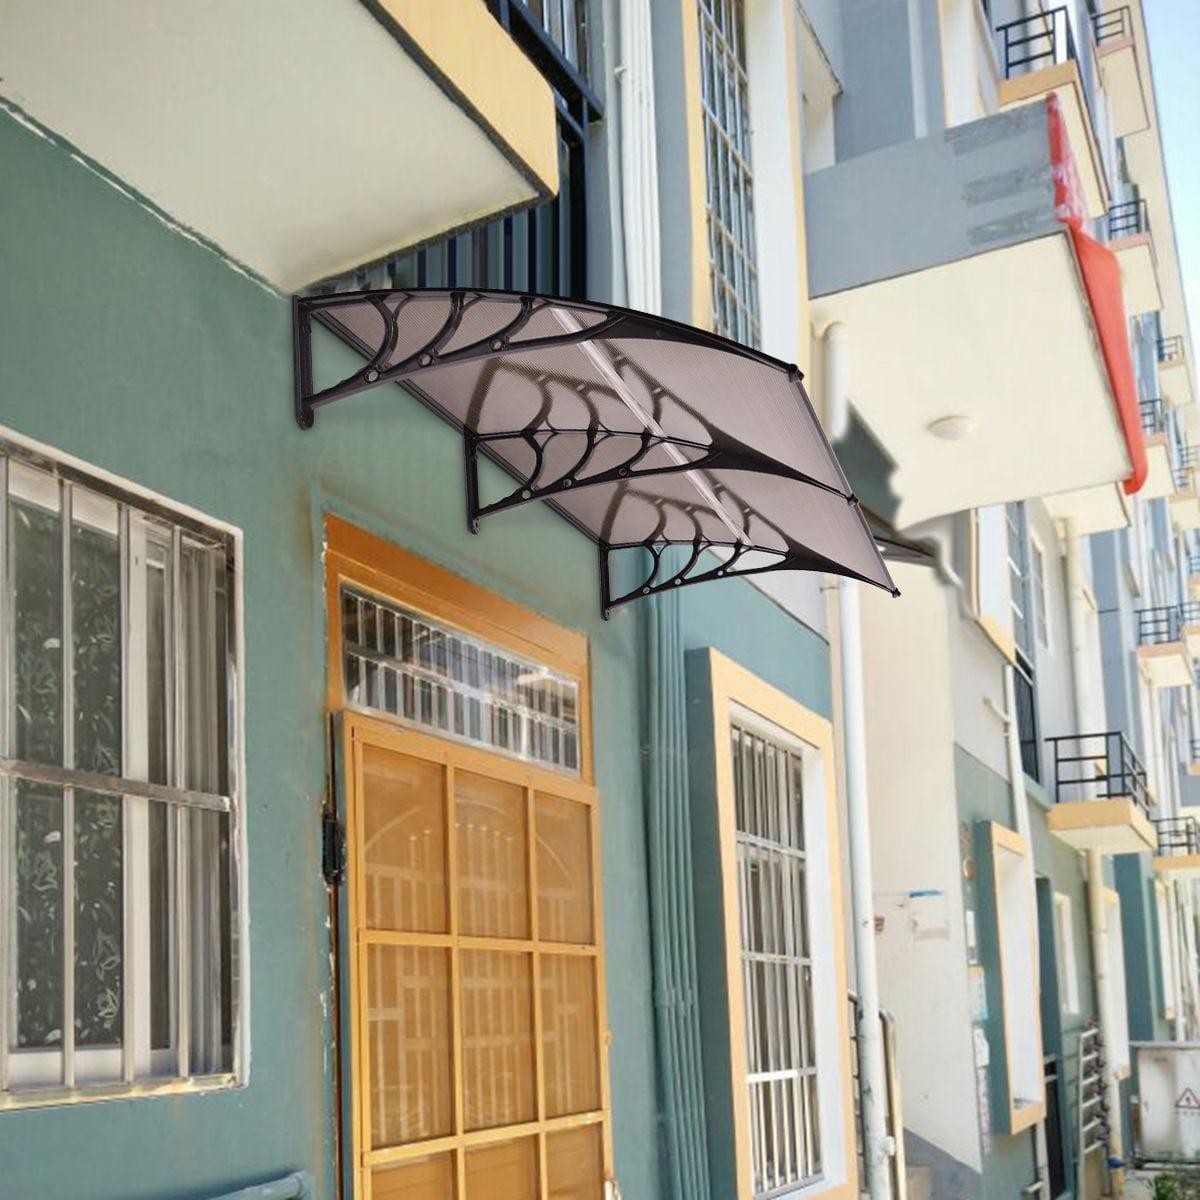 Costway 80 X 40 Window Awning Door Canopy Outdoor Polycarbonate